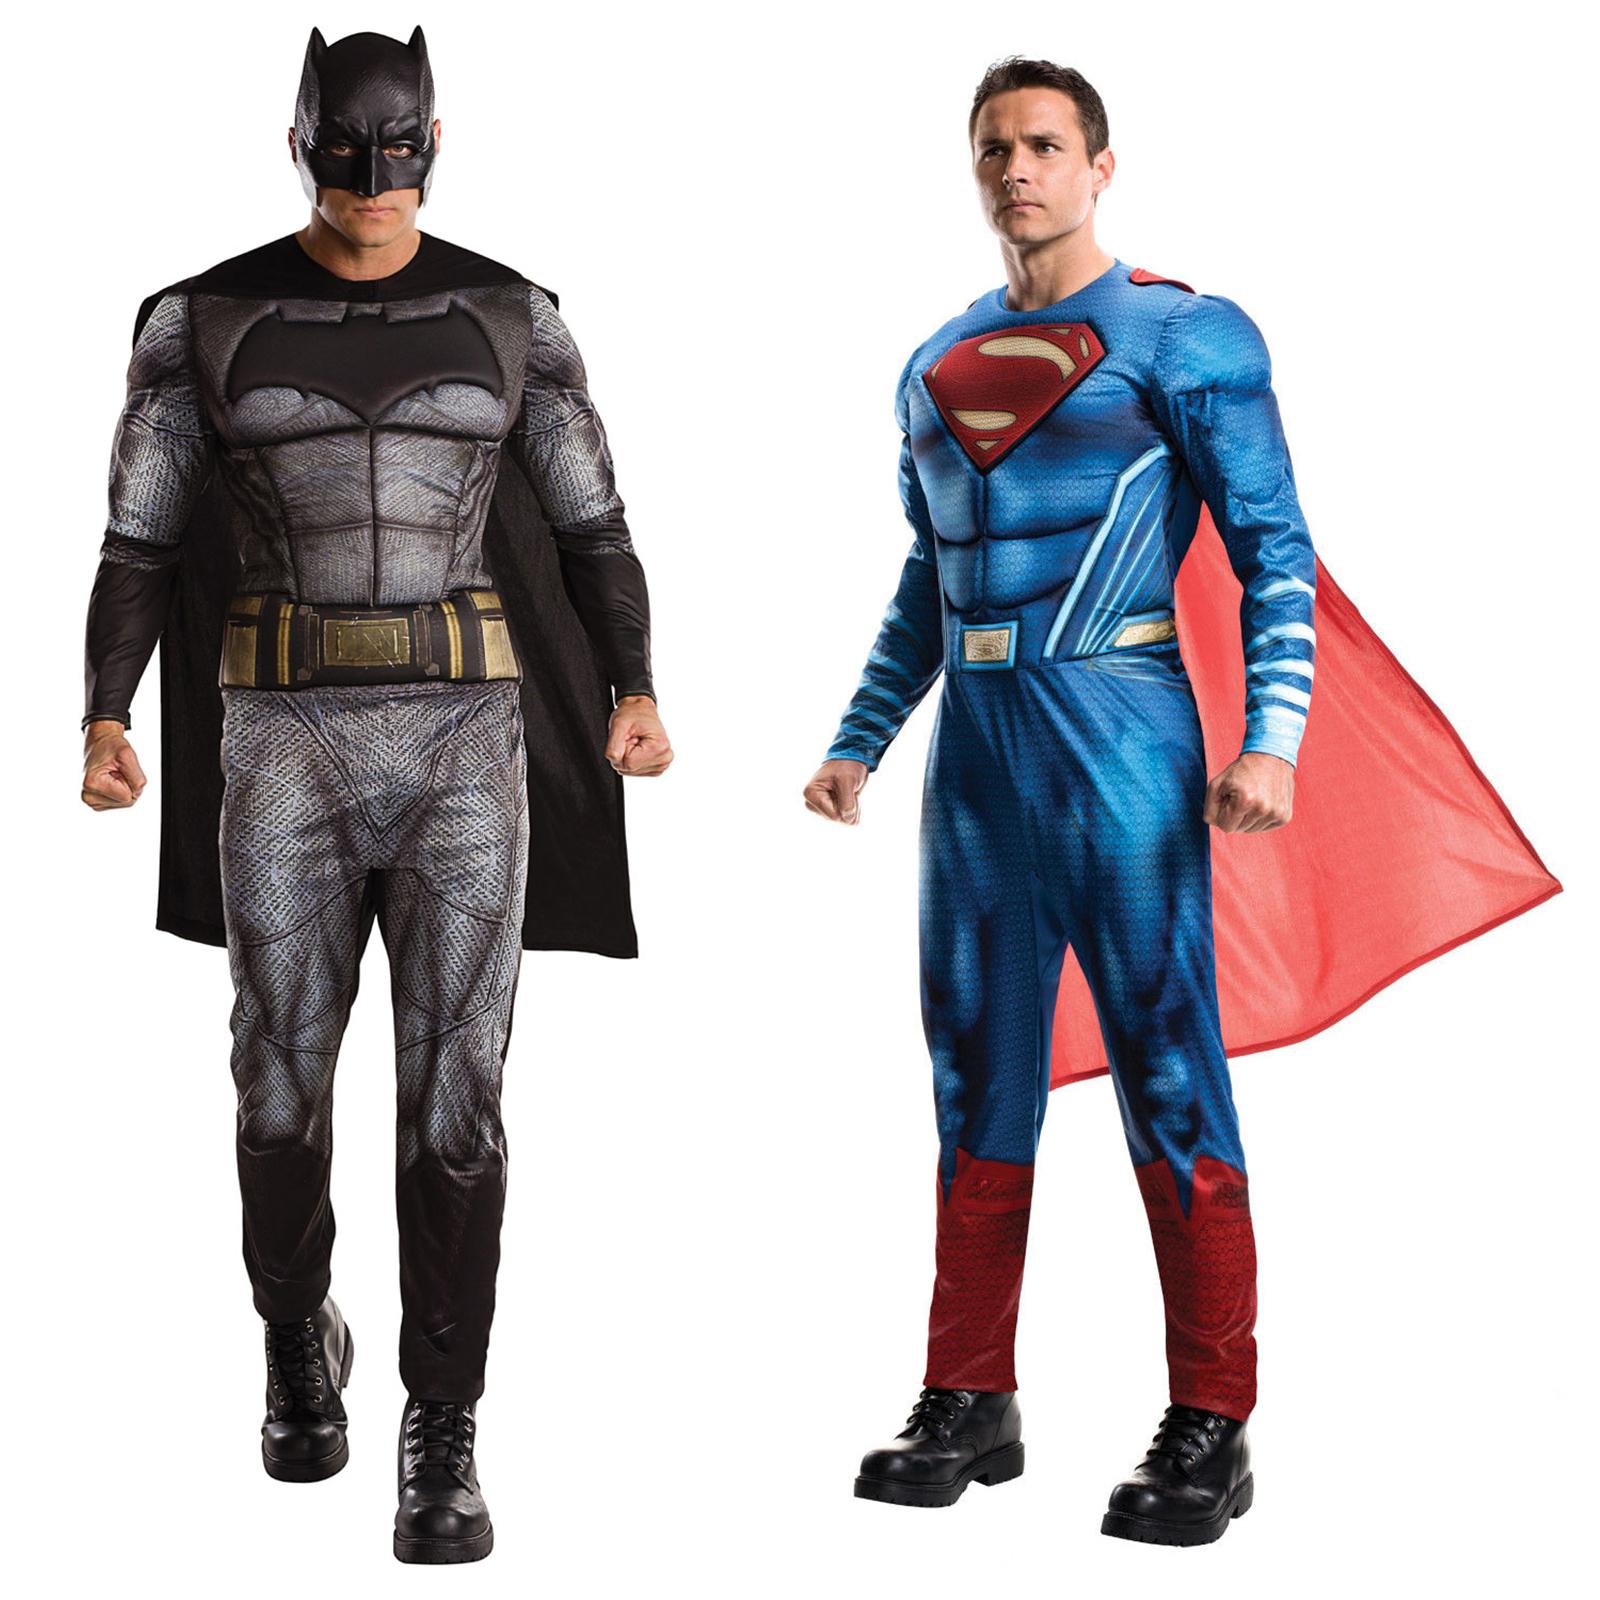 /un tama/ño Rubies s oficial adultos de Superman Cape Dawn de justicia/